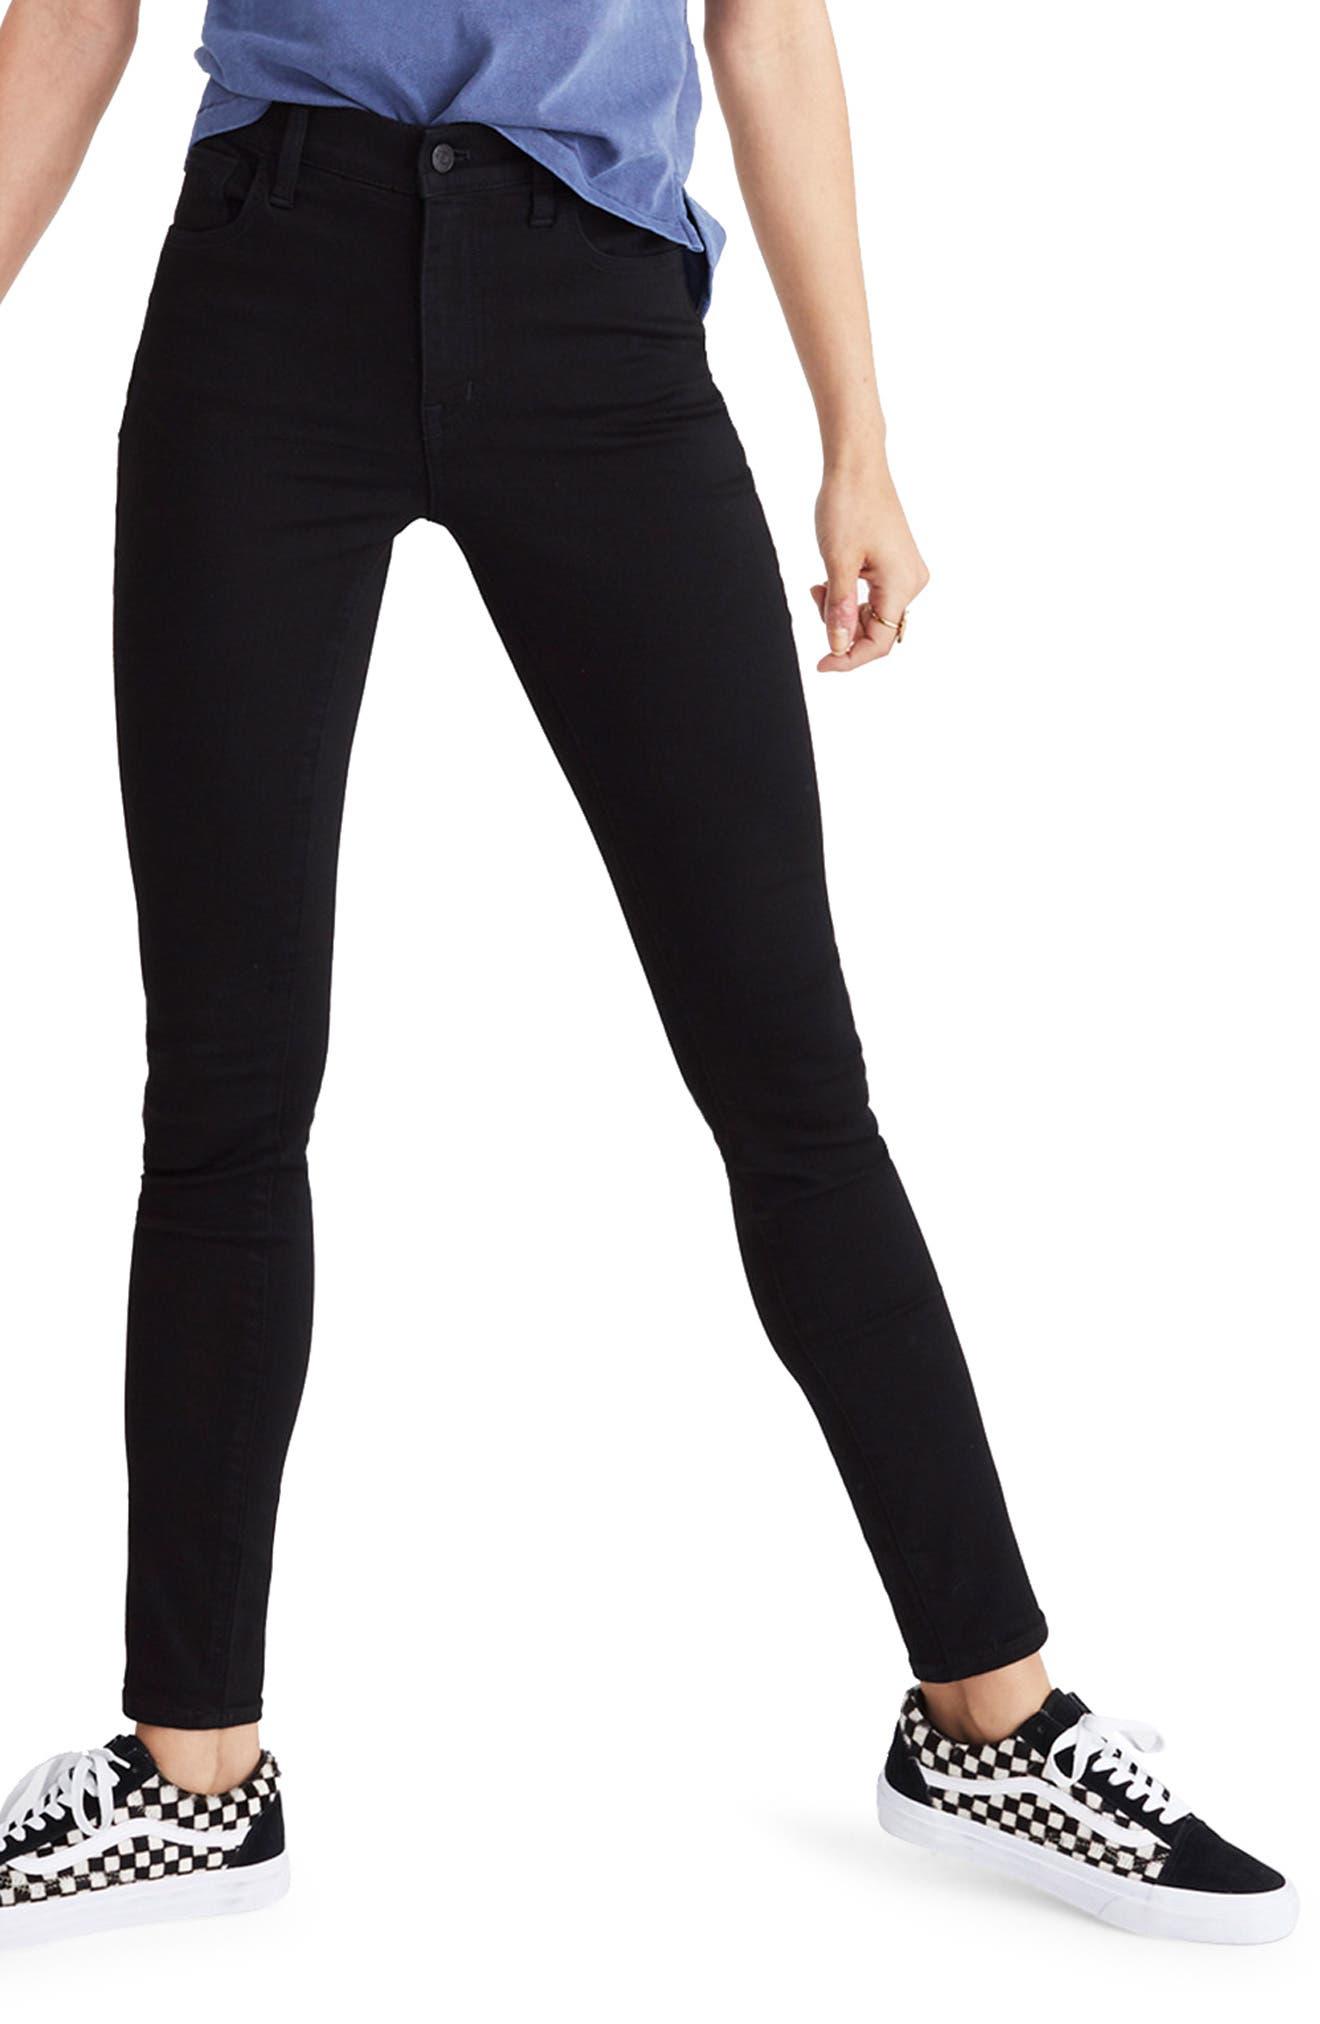 Roadtripper Skinny Jeans,                             Main thumbnail 1, color,                             BENNET WASH